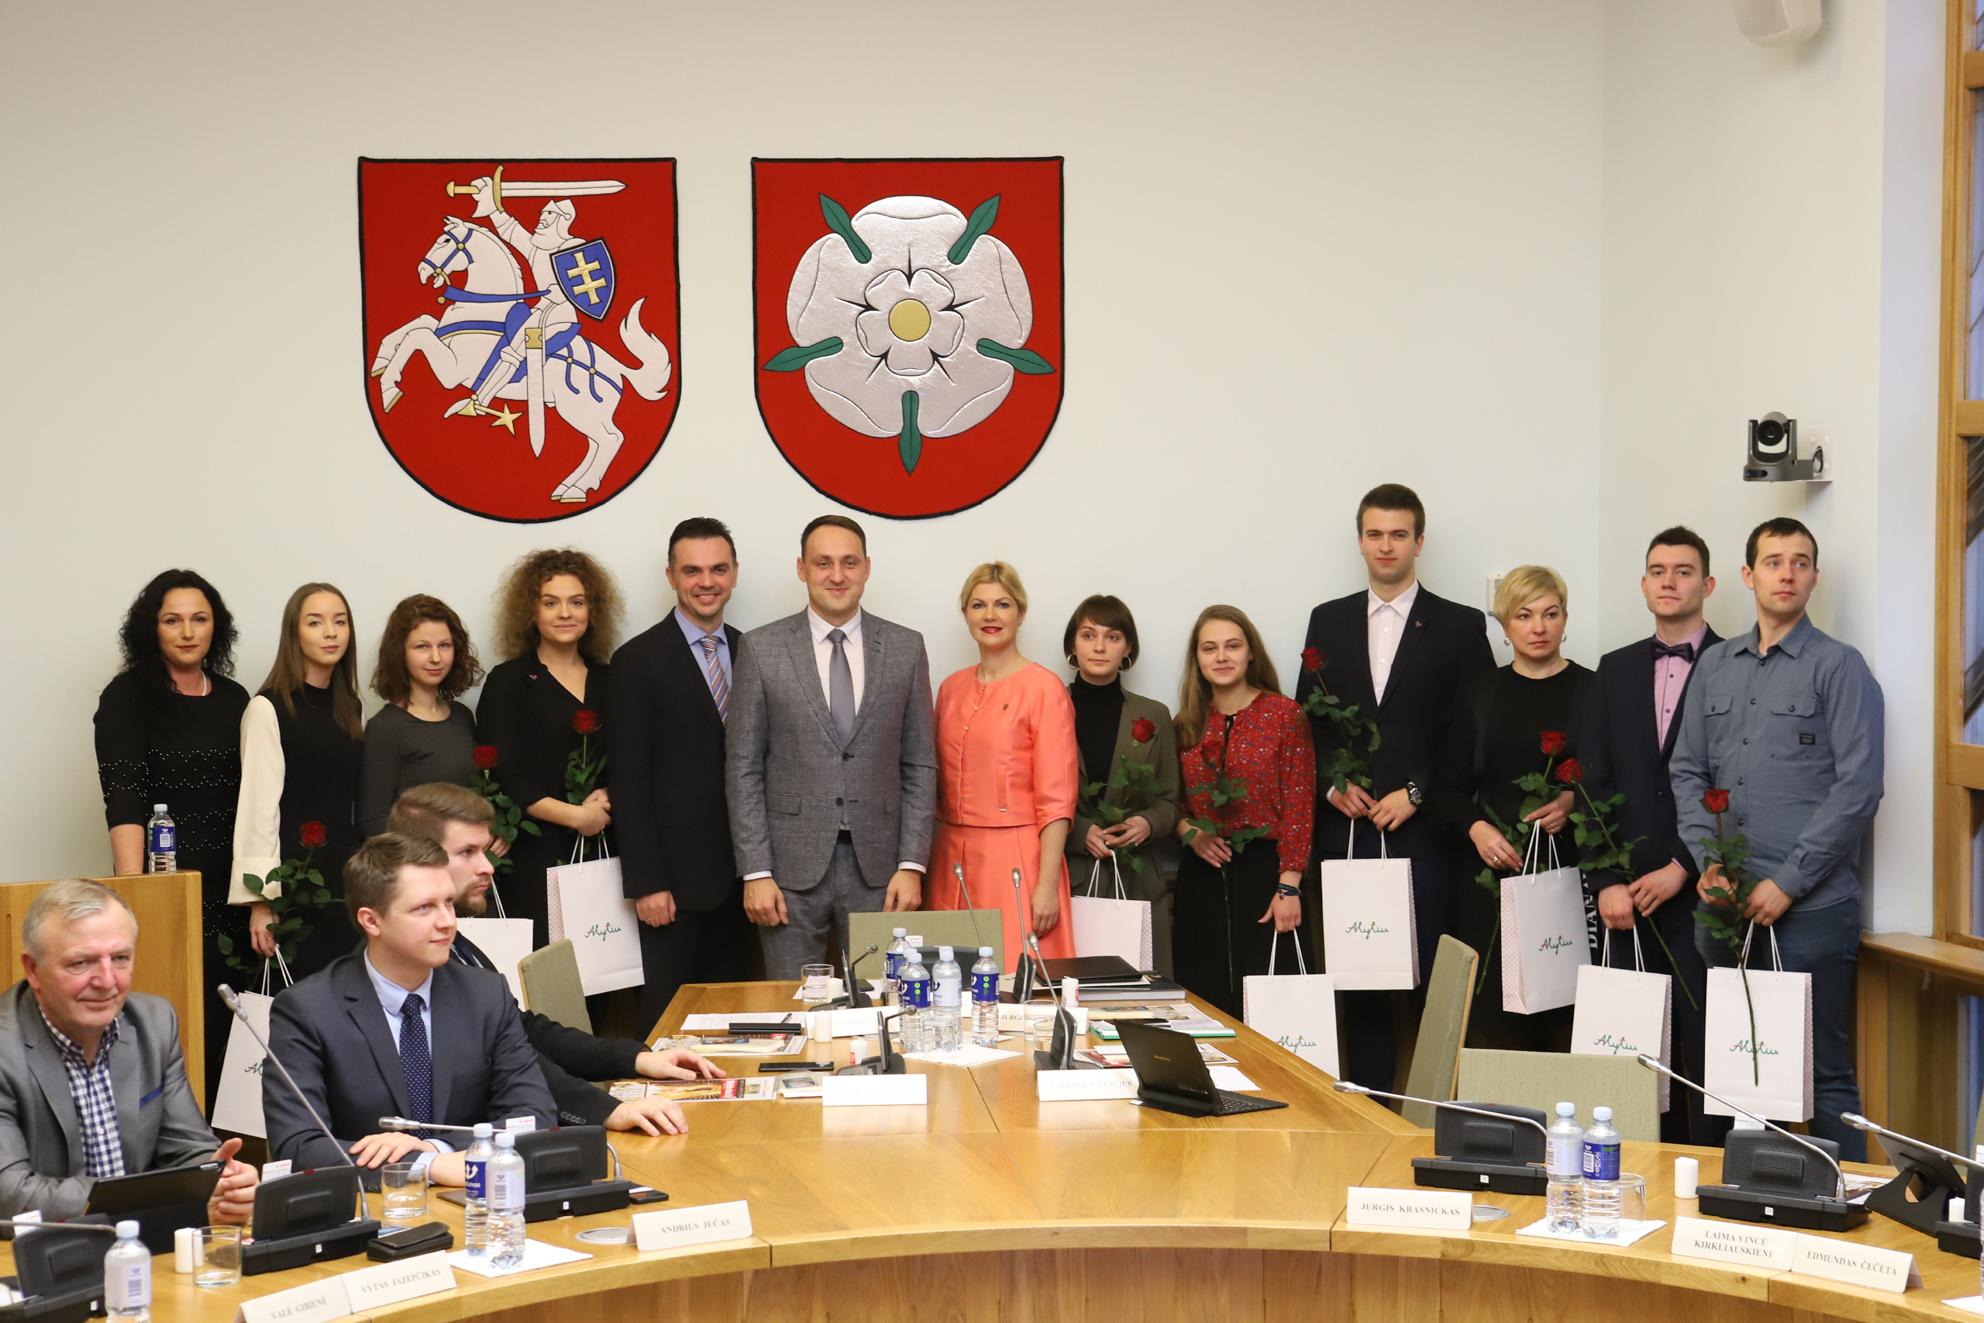 Jaunųjų žurnalistų kursai: Premija Mildai Sakavičiūtei